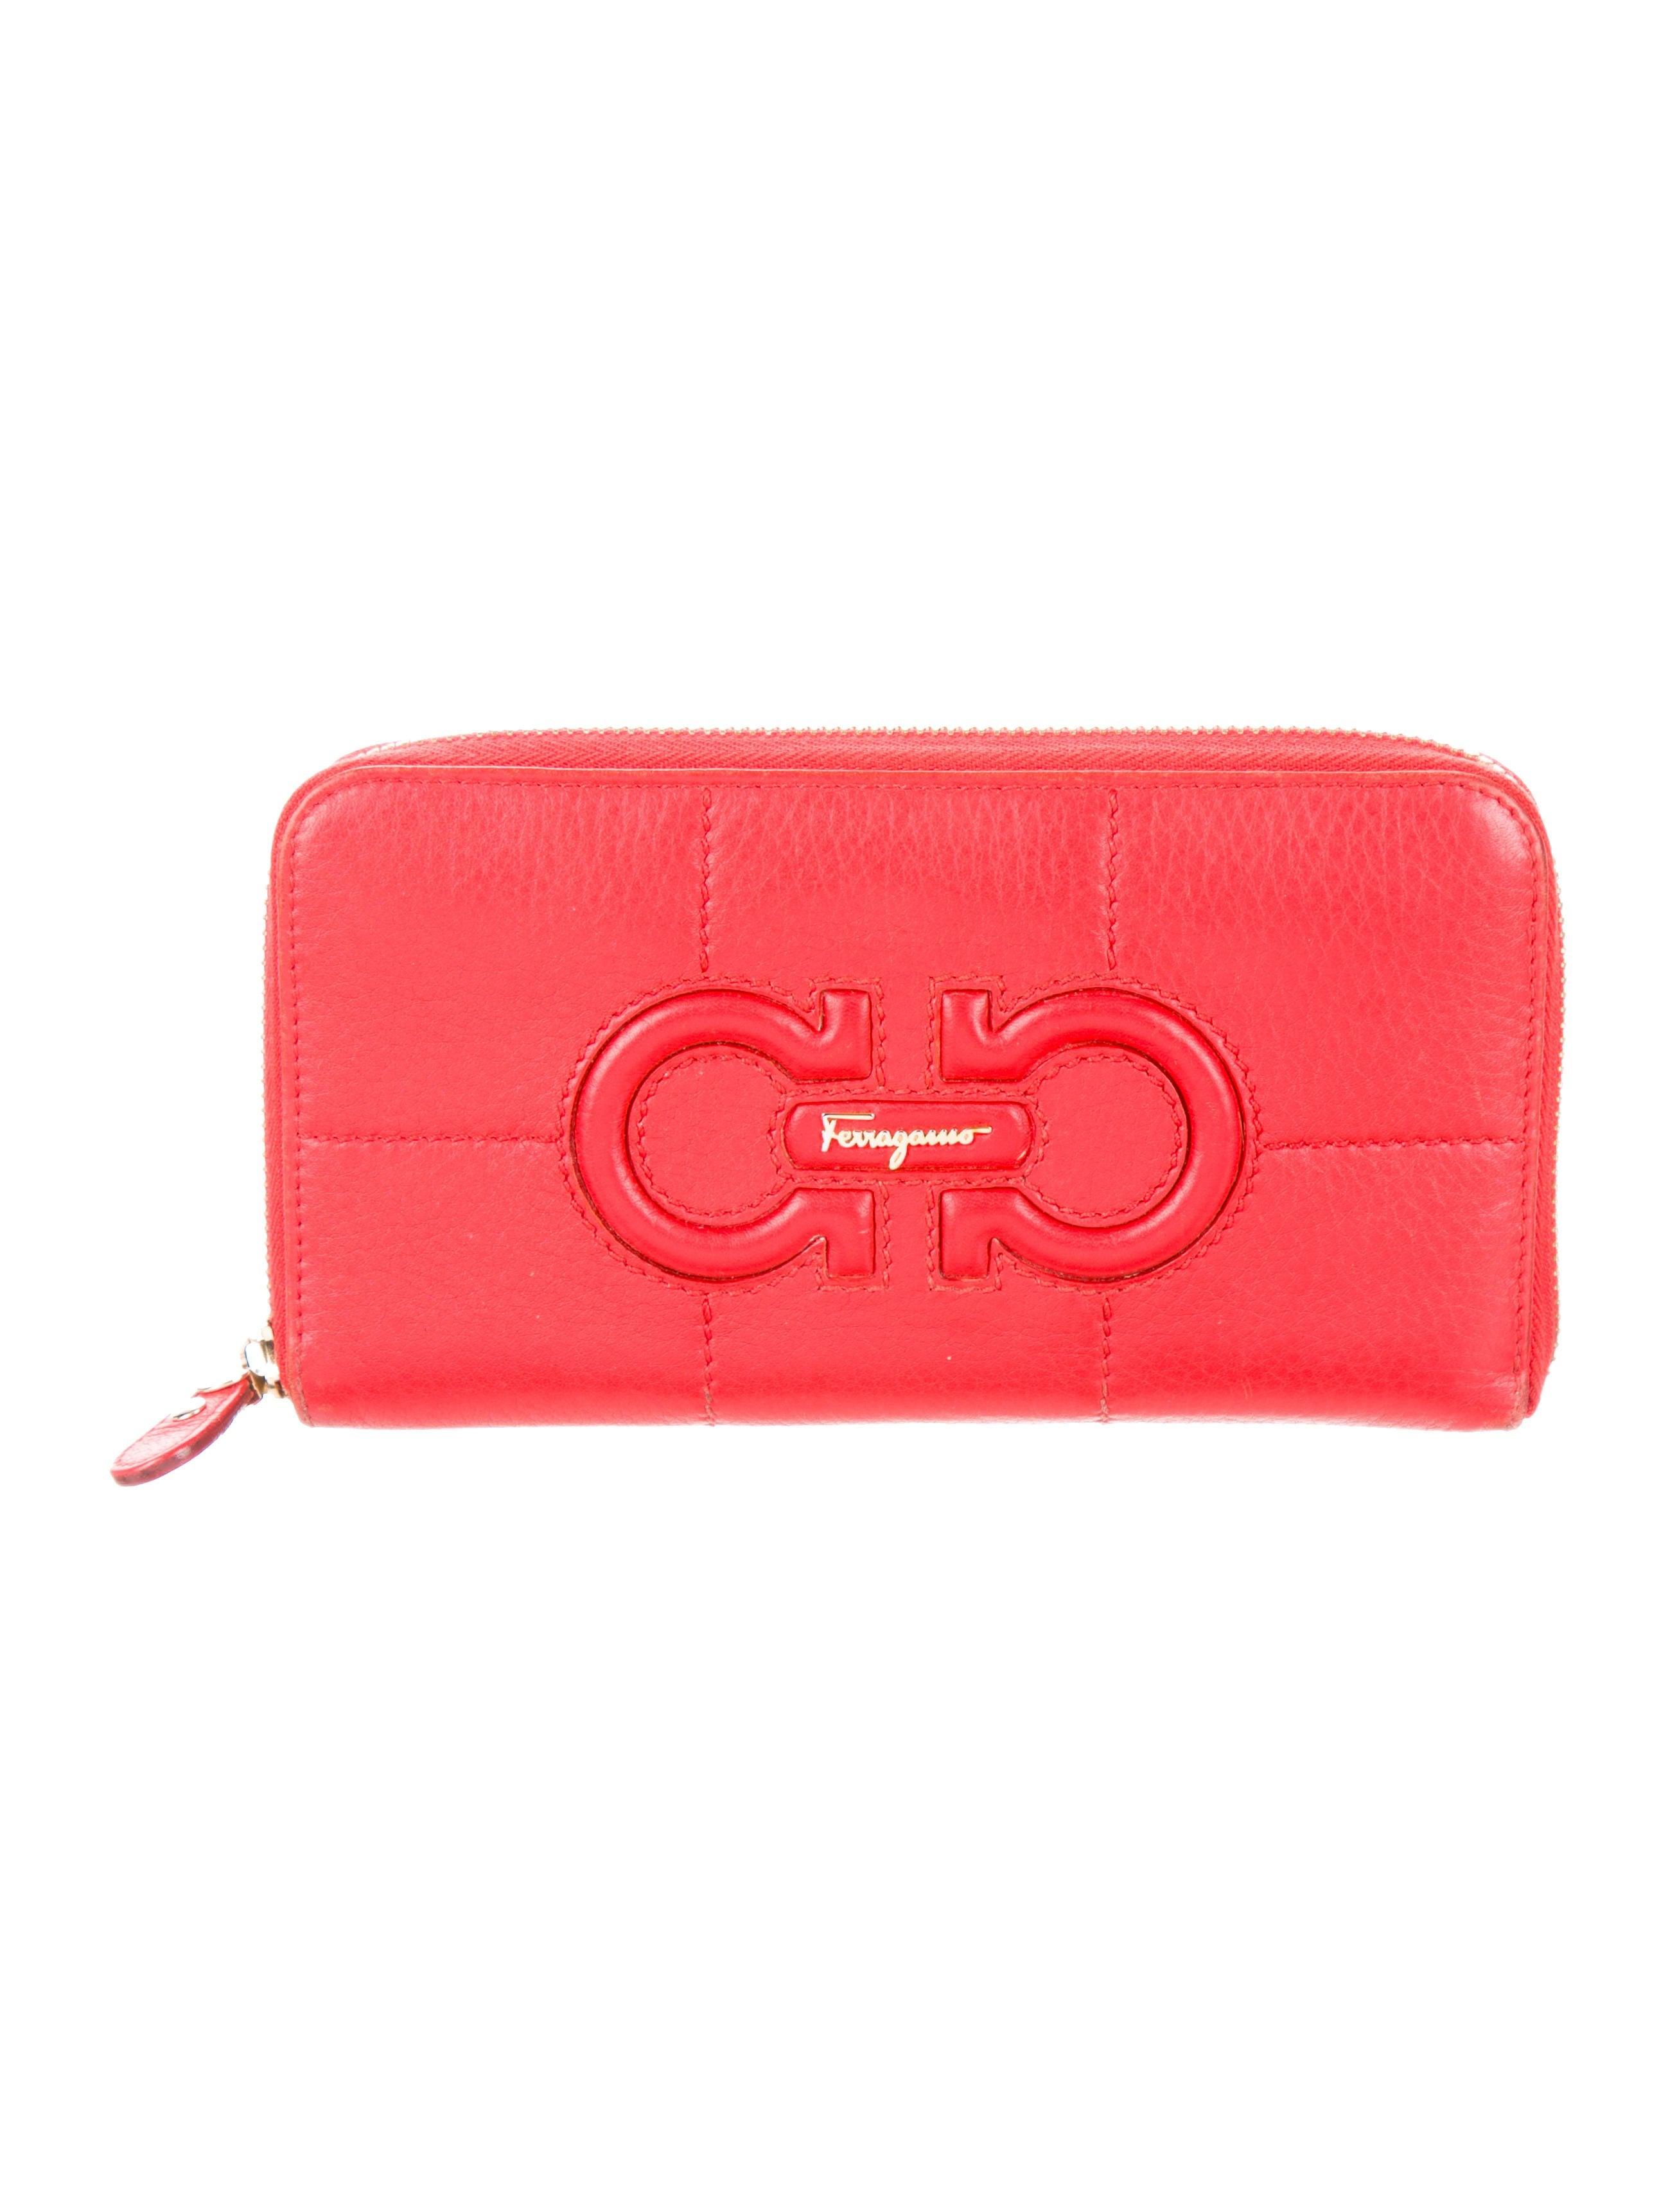 Gancini zip-around wallet - Red Salvatore Ferragamo Discounts Cheap Online New Discount 2018 Unisex SnWm1